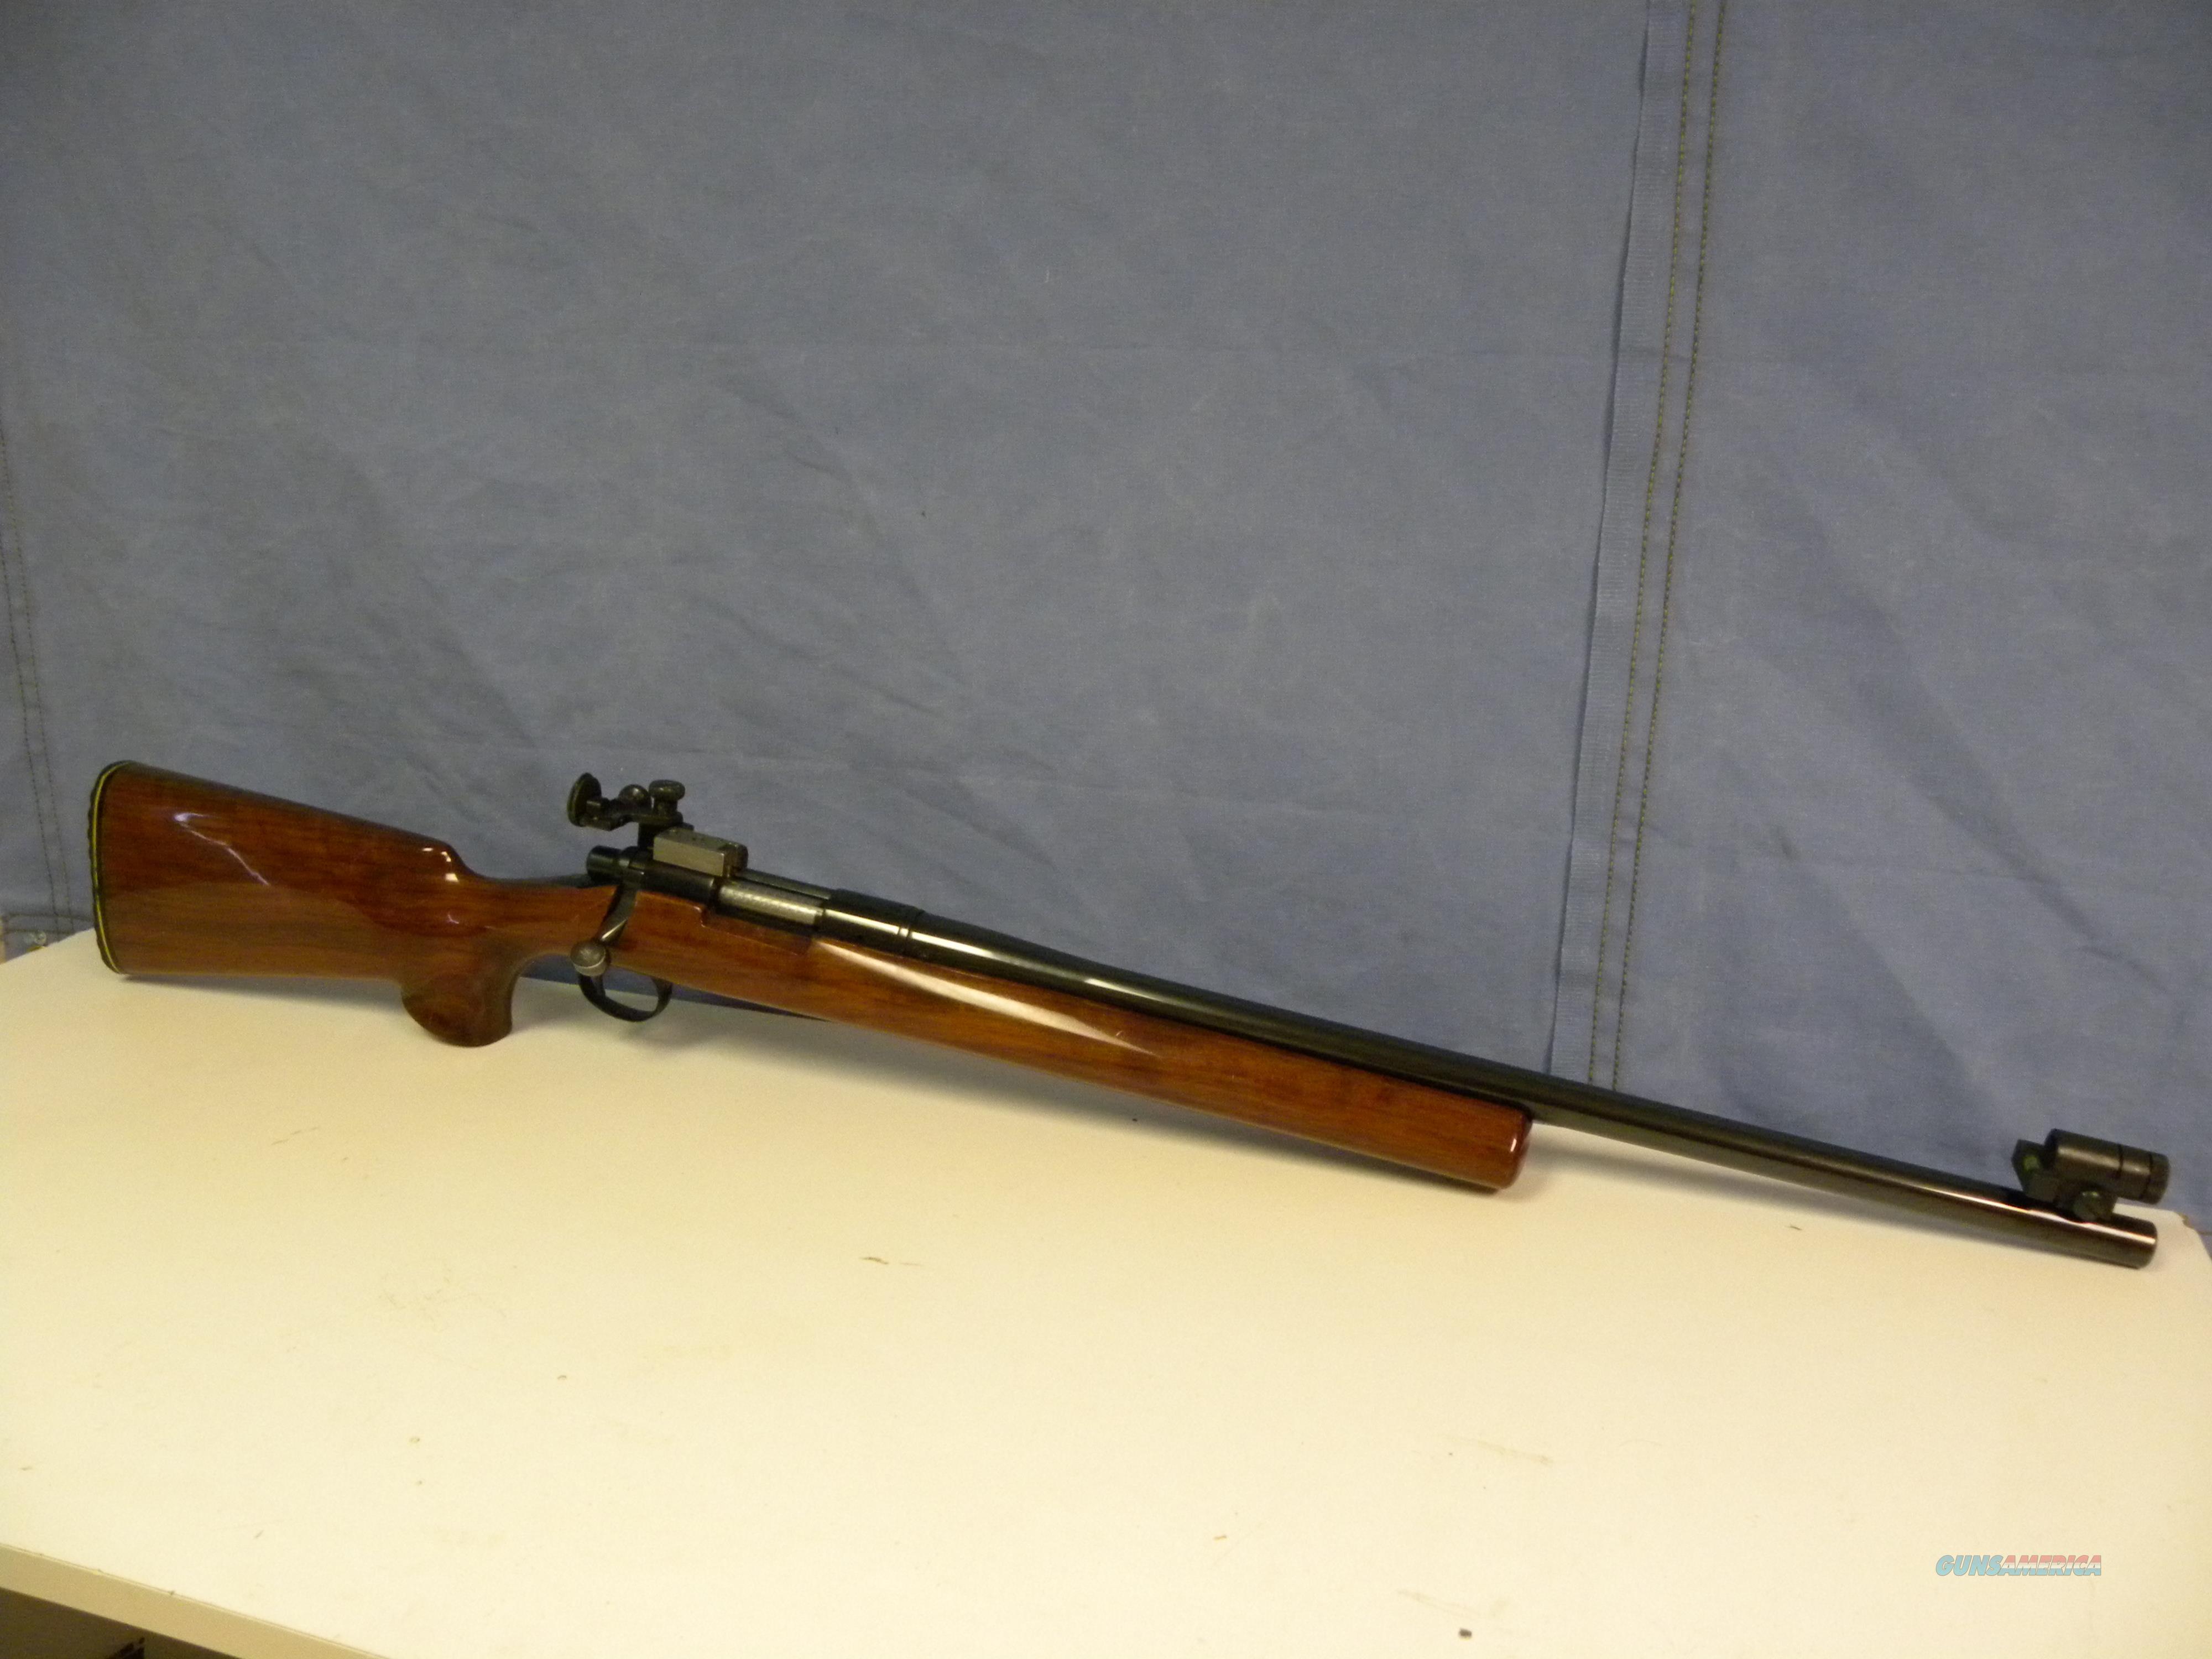 Remington 700 .223 Target Rifle  Guns > Rifles > Remington Rifles - Modern > Model 700 > Sporting